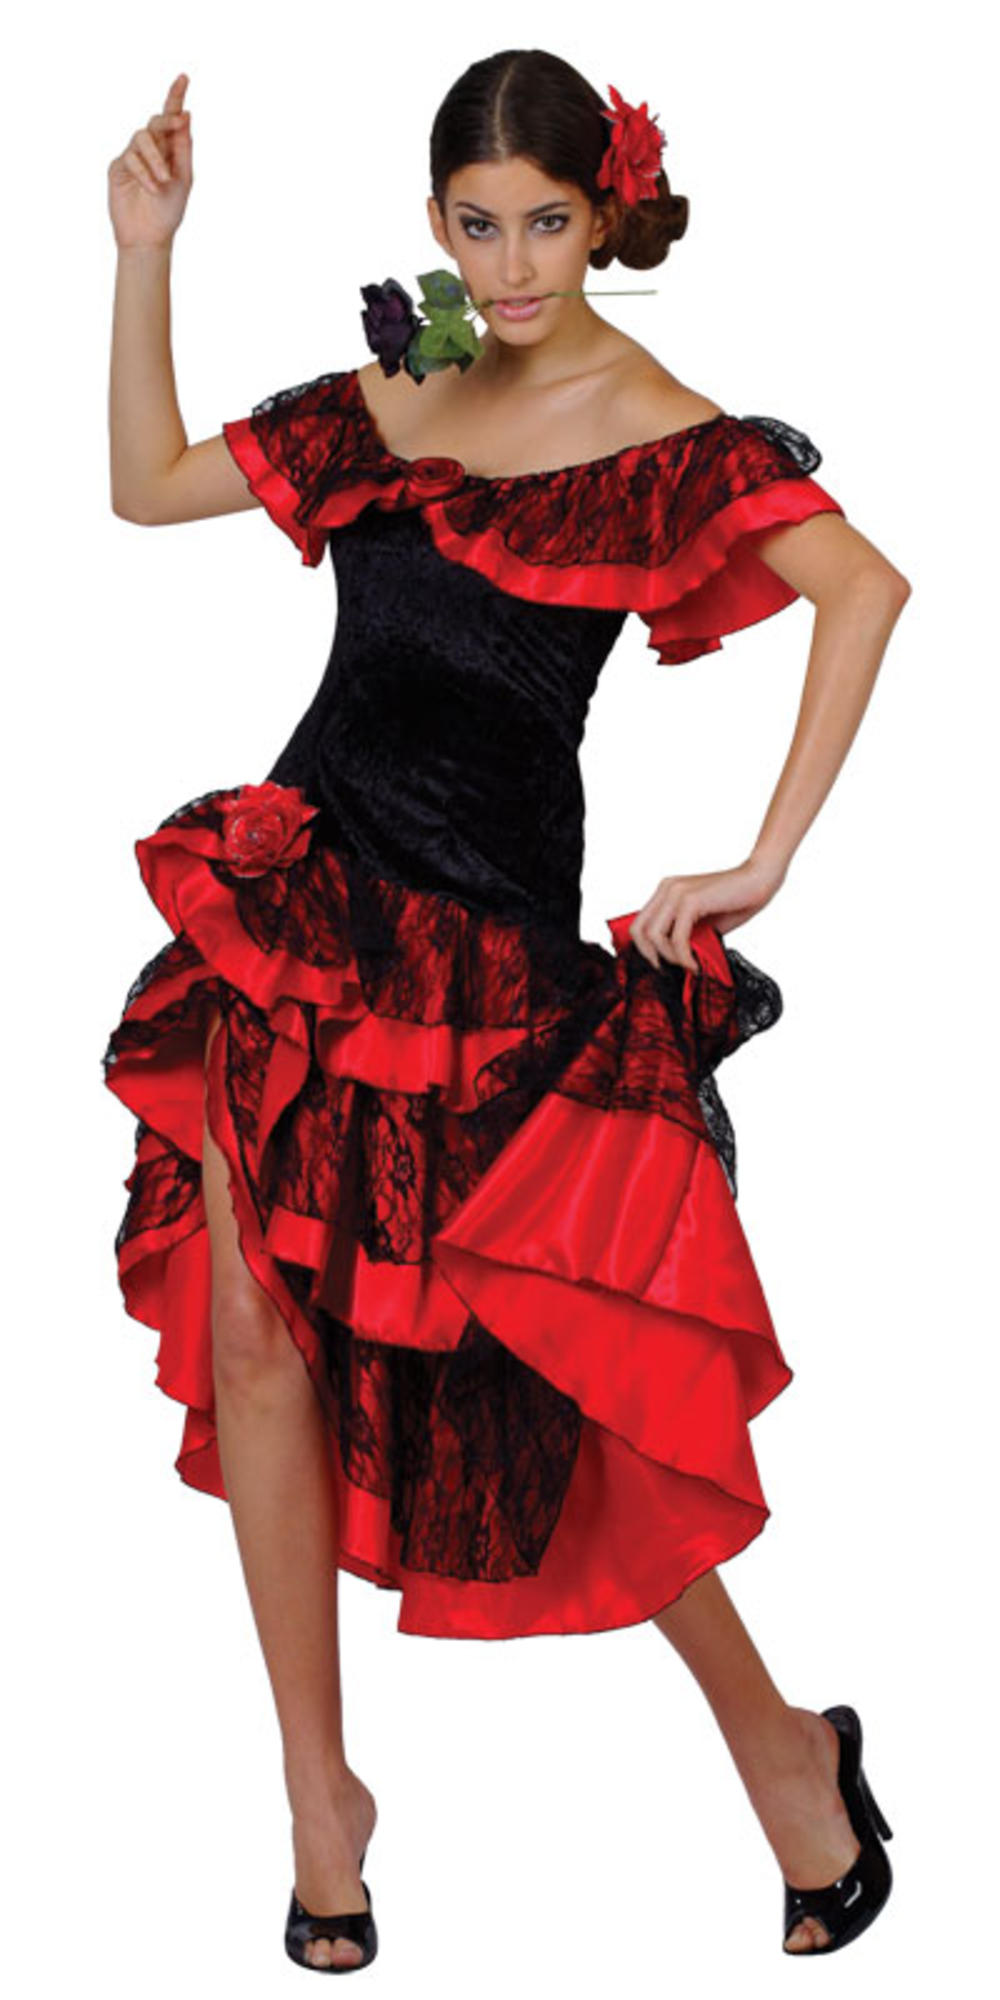 Spanish Senorita Ladies Fancy National Dress Party Salsa Flamenco Dancer Costume